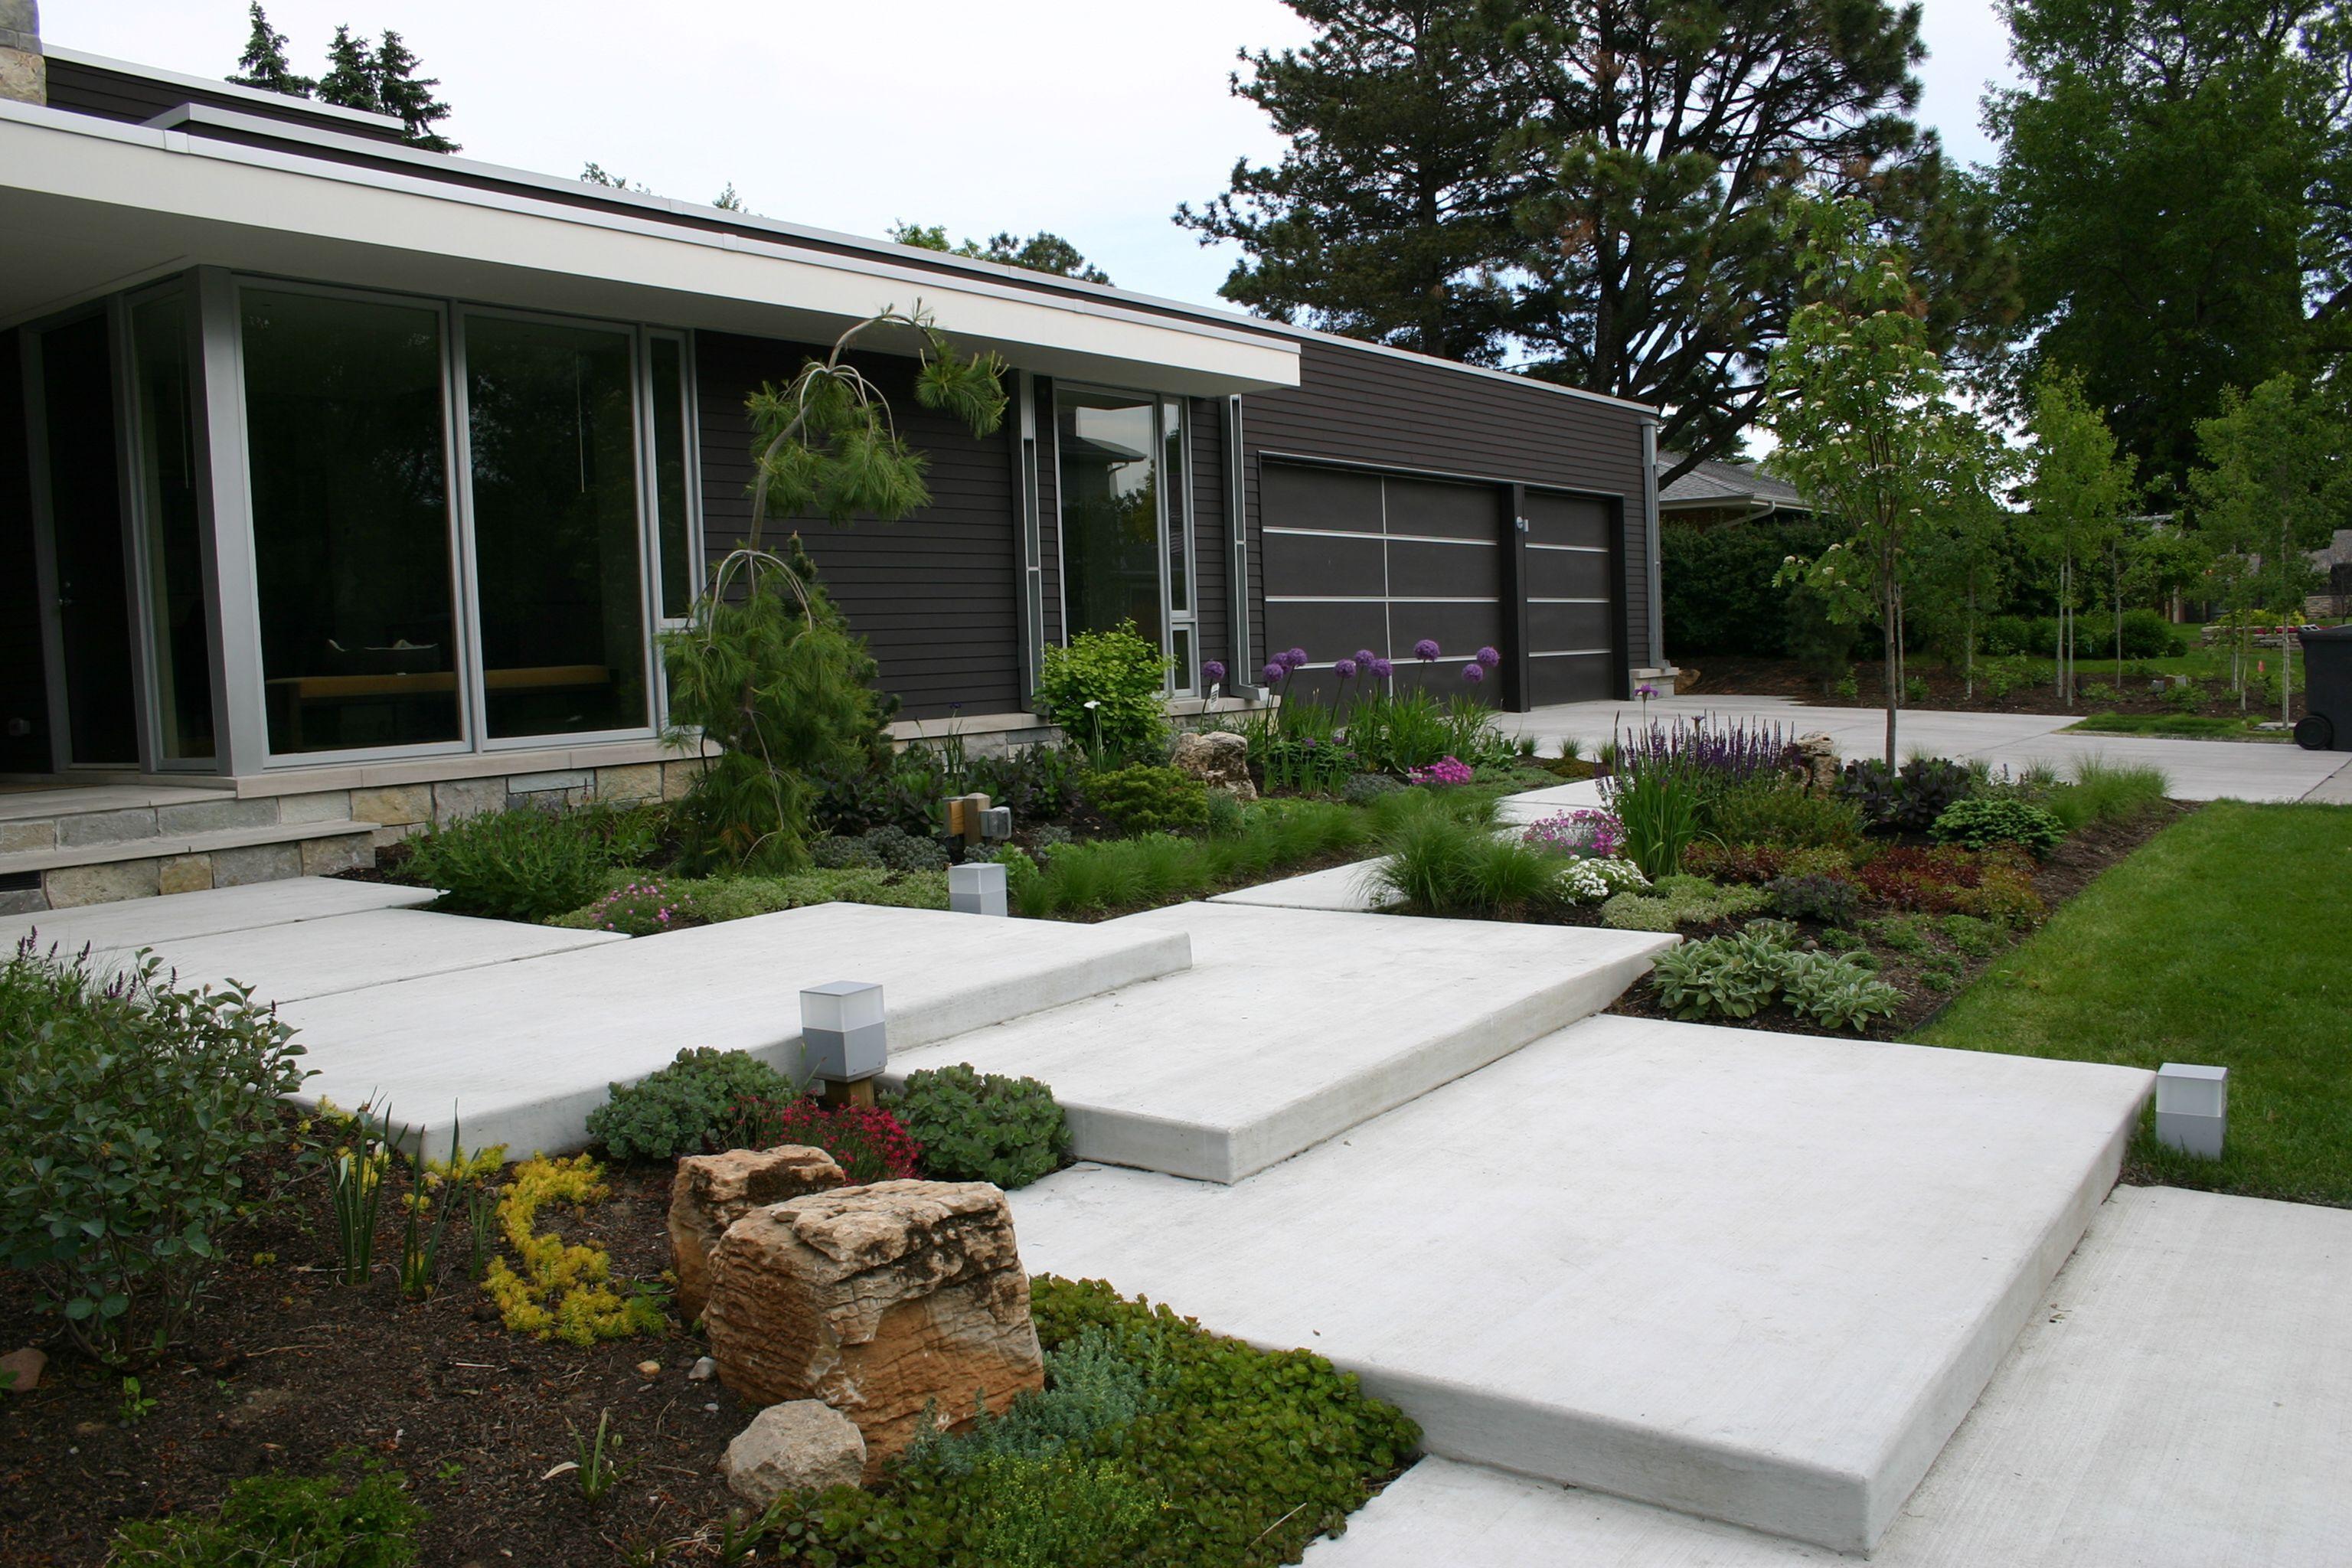 35 Top Modern Minimalist And Stylish Garden Ideas For Modern House With Images Modern Landscaping Modern Garden Contemporary Garden Design